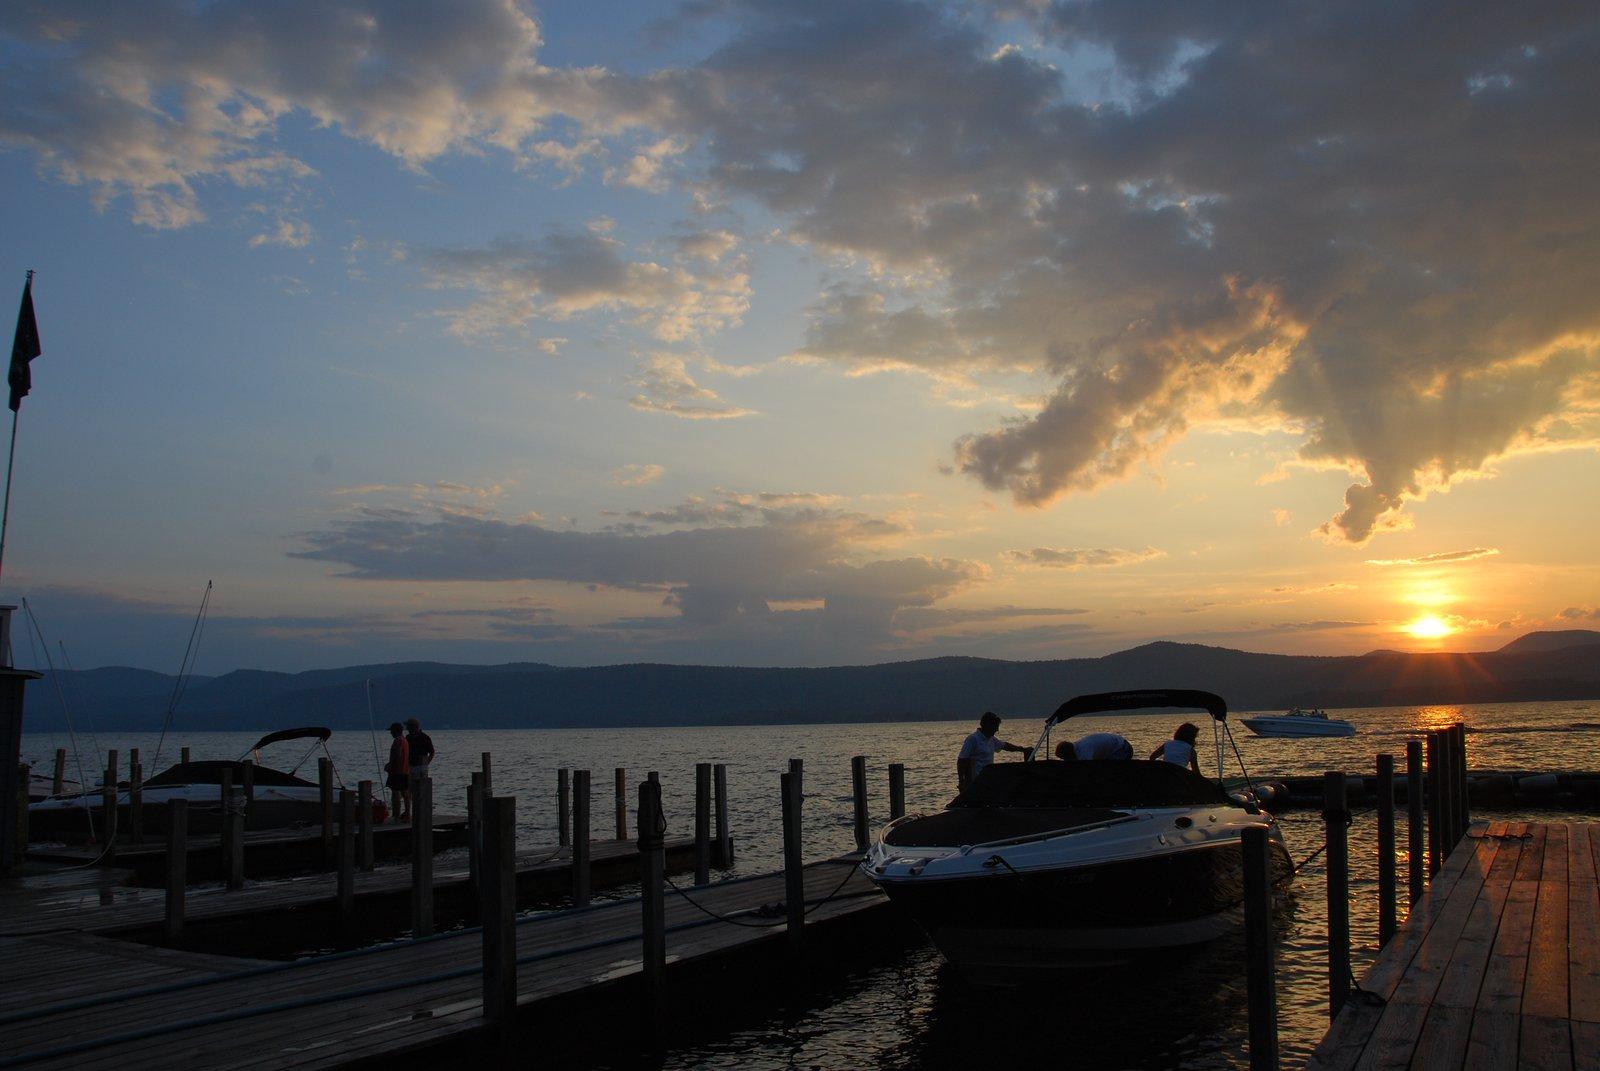 LG Sunset 2